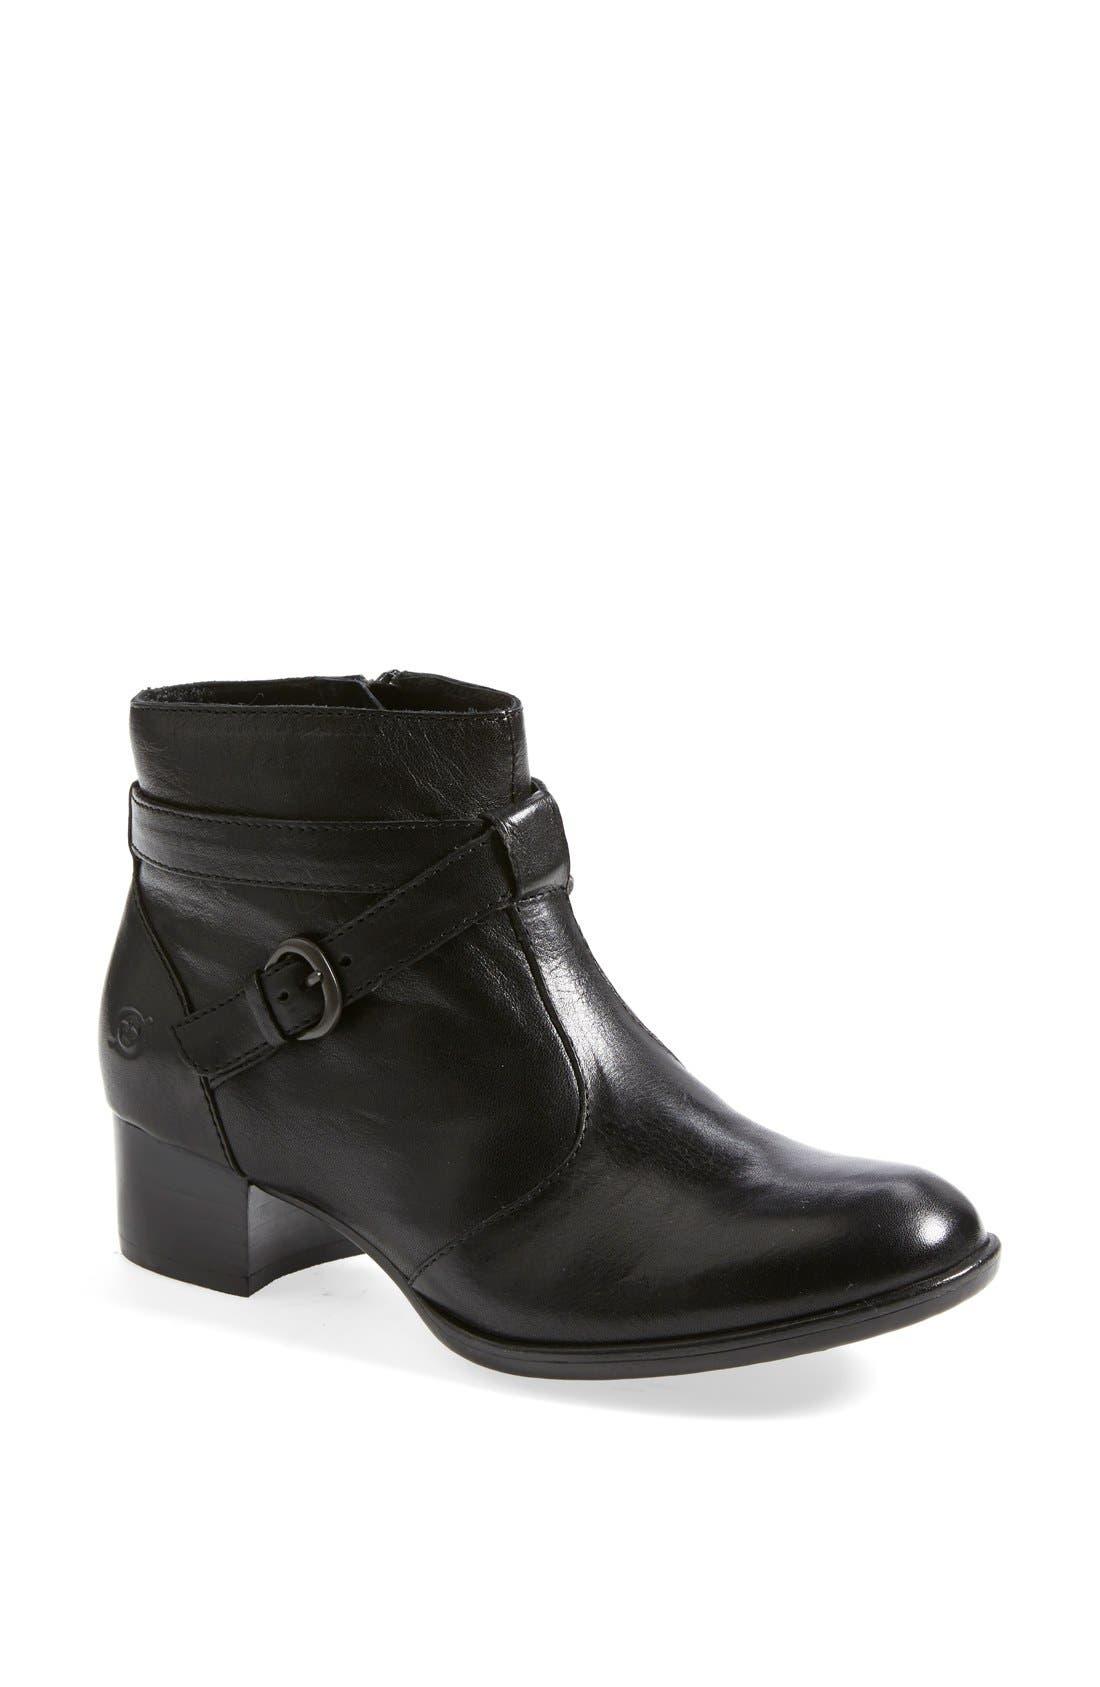 Alternate Image 1 Selected - Børn 'Kyndra' Boot (Women)